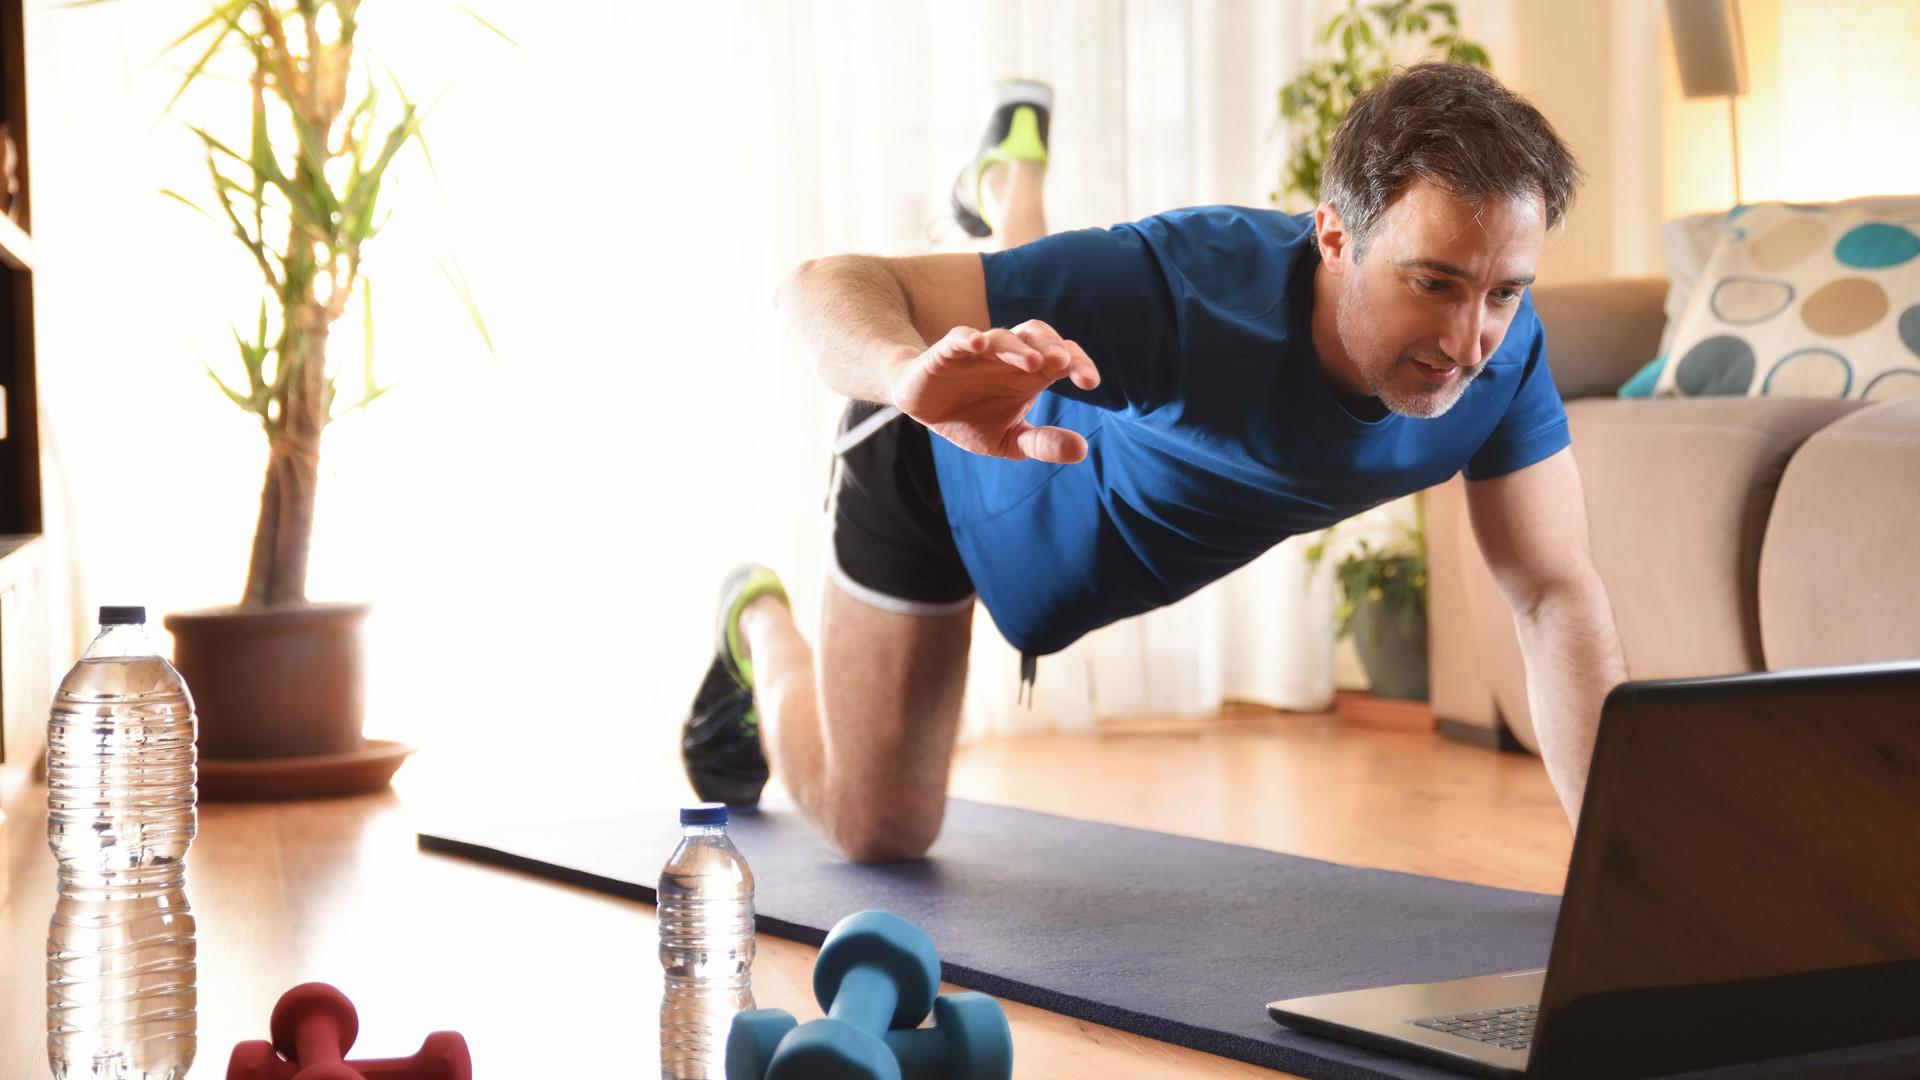 Man doing sports on a mat watching video